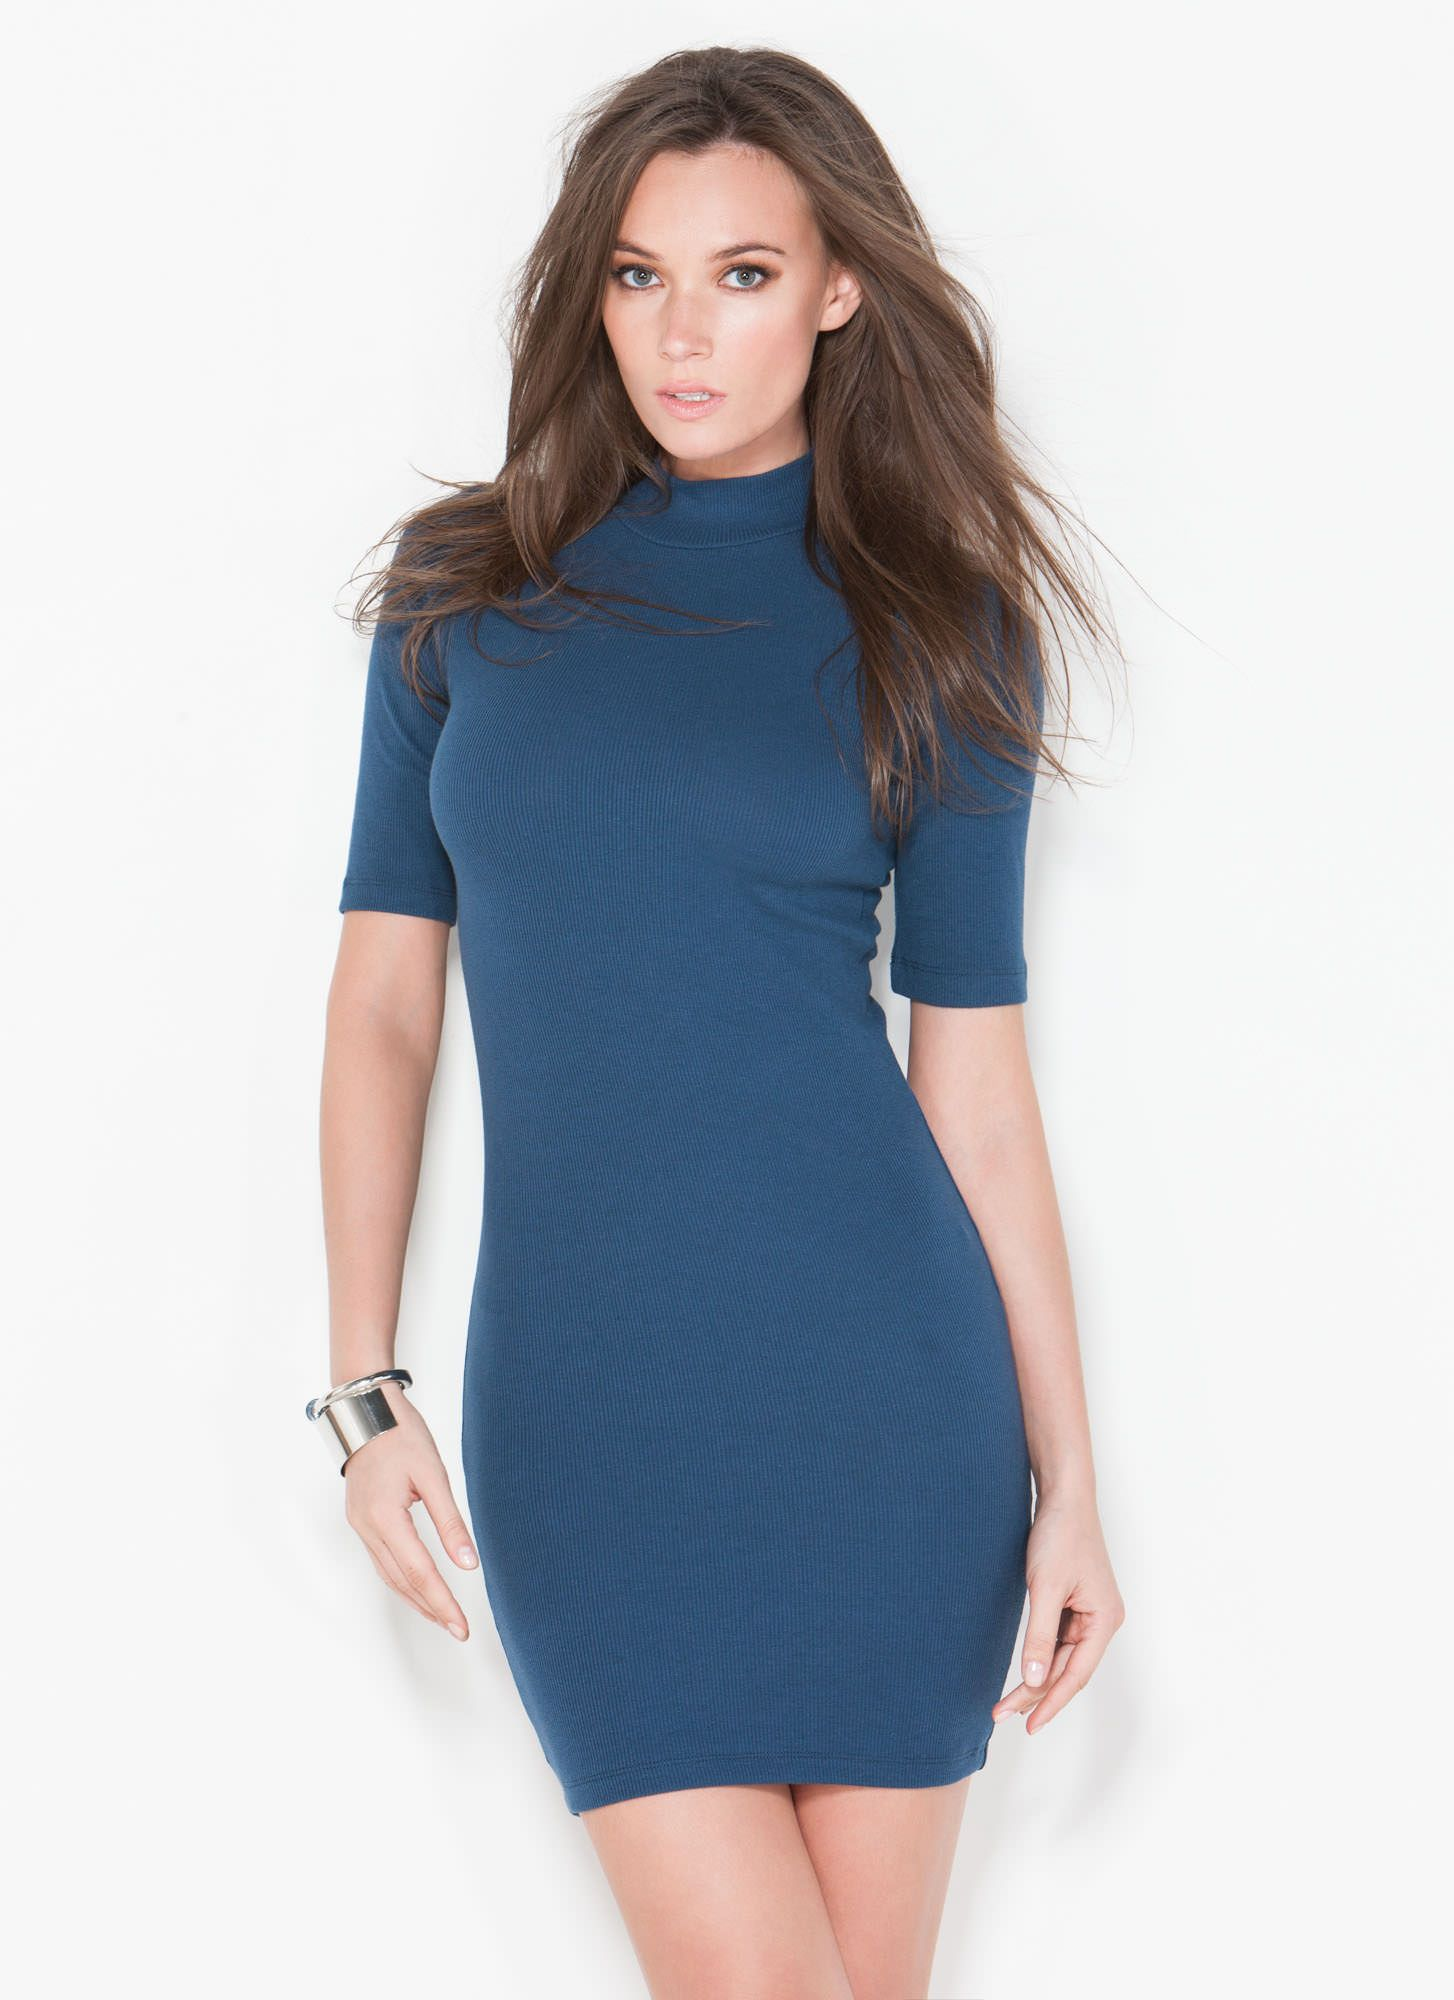 Ribbed For My Pleasure Mockneck Dress GoJane.com | Dresses ...